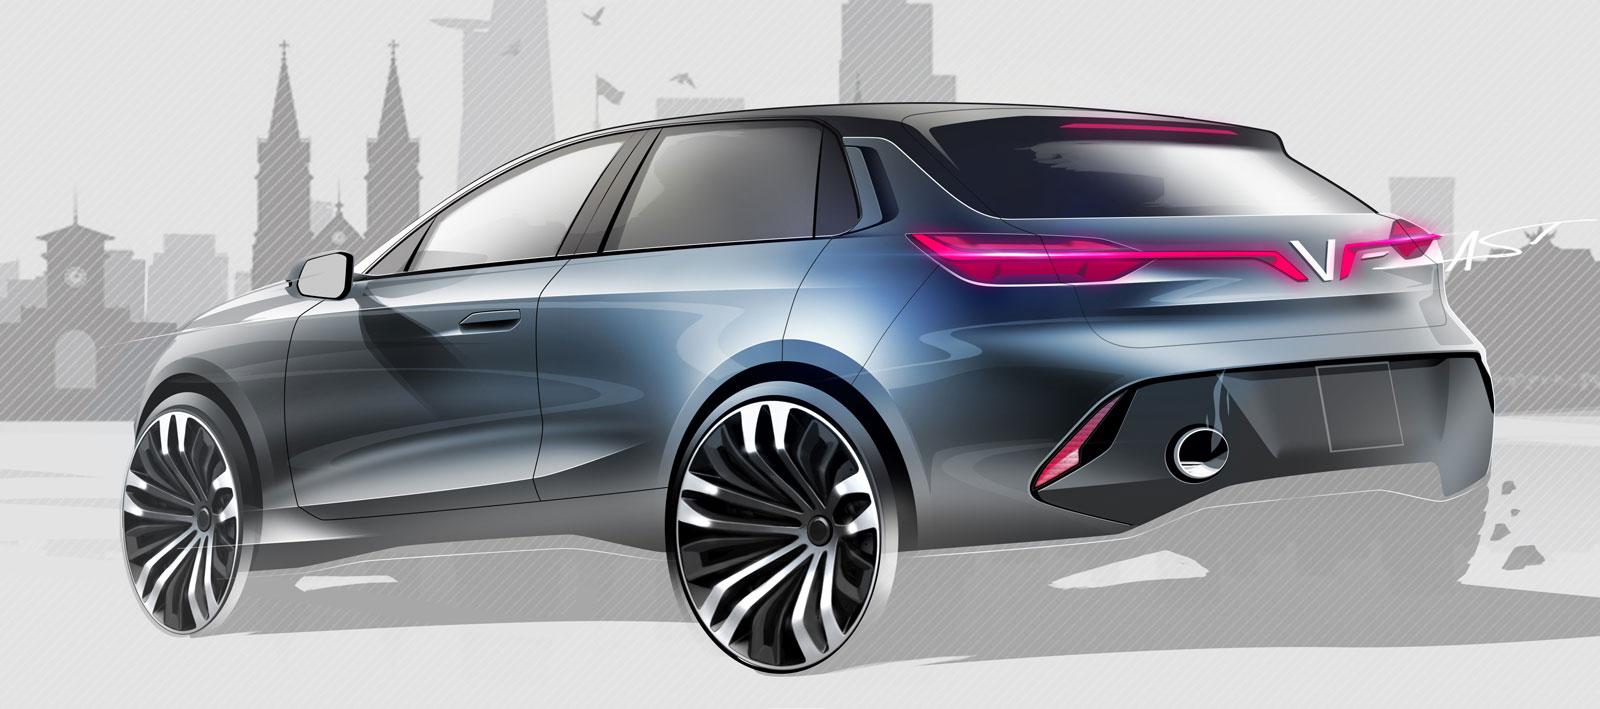 Italdesign Chosen by Public to Design Cars for Vietnamese ...